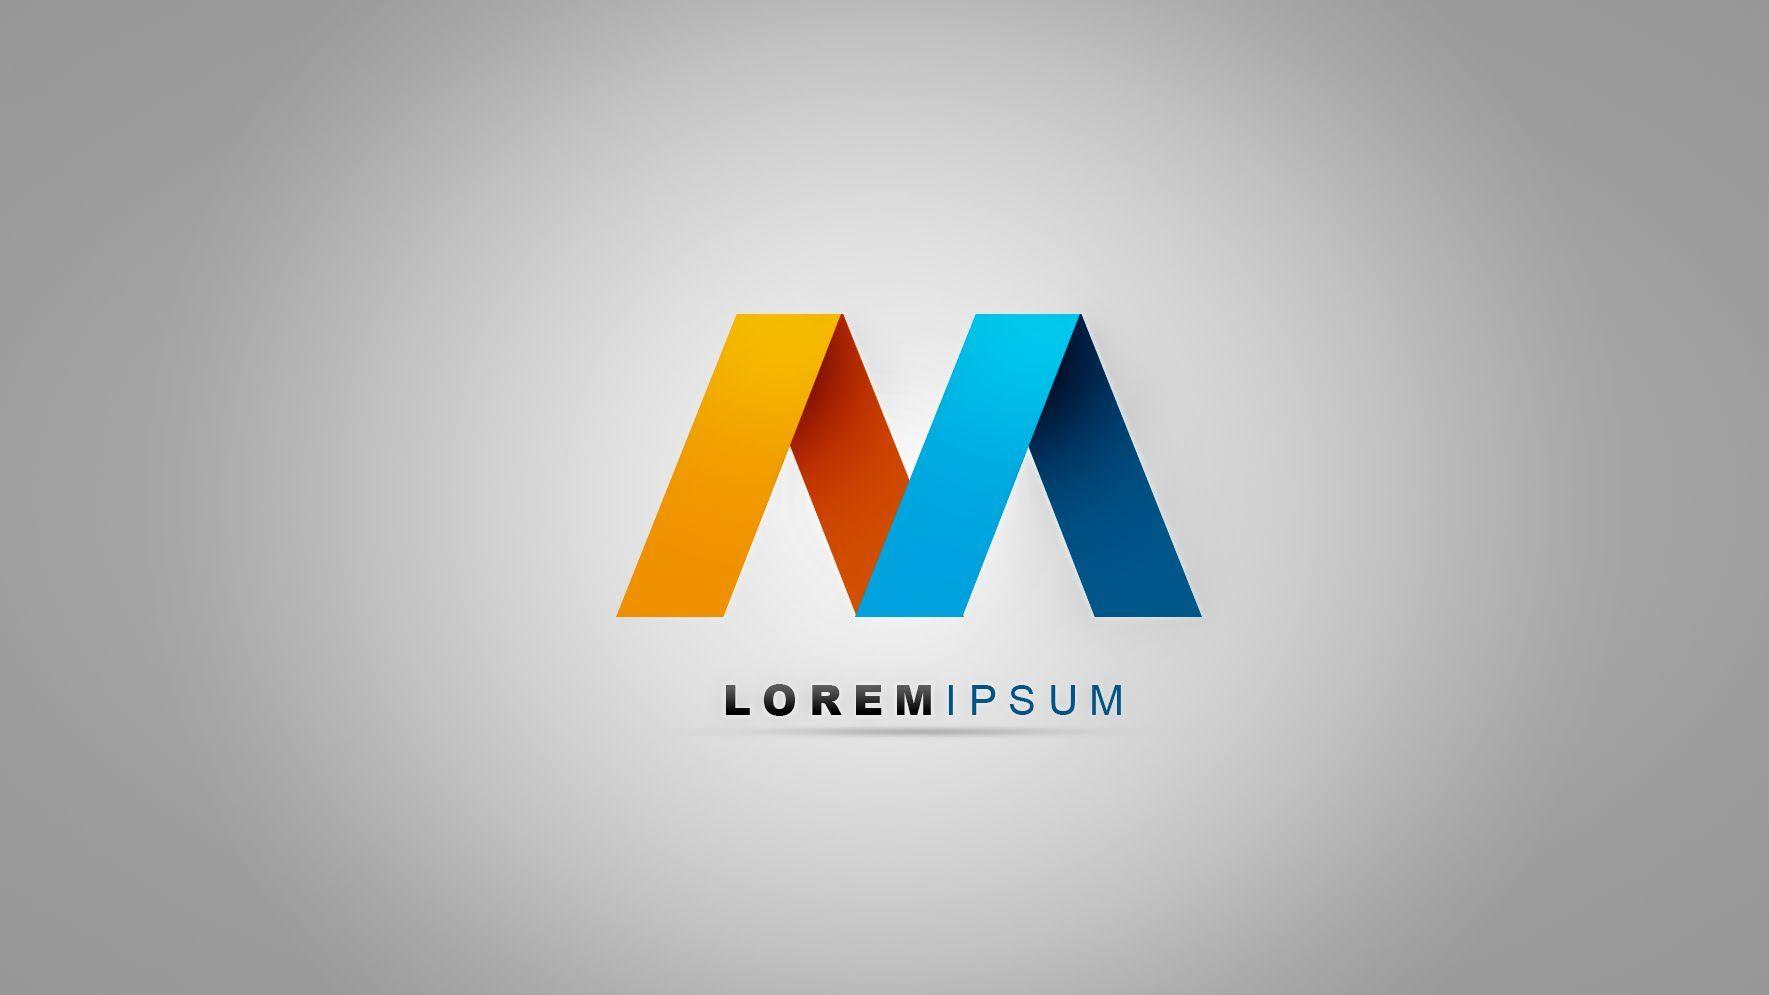 Photoshop tutorial professional logo design logo design photoshop tutorial professional logo design baditri Image collections